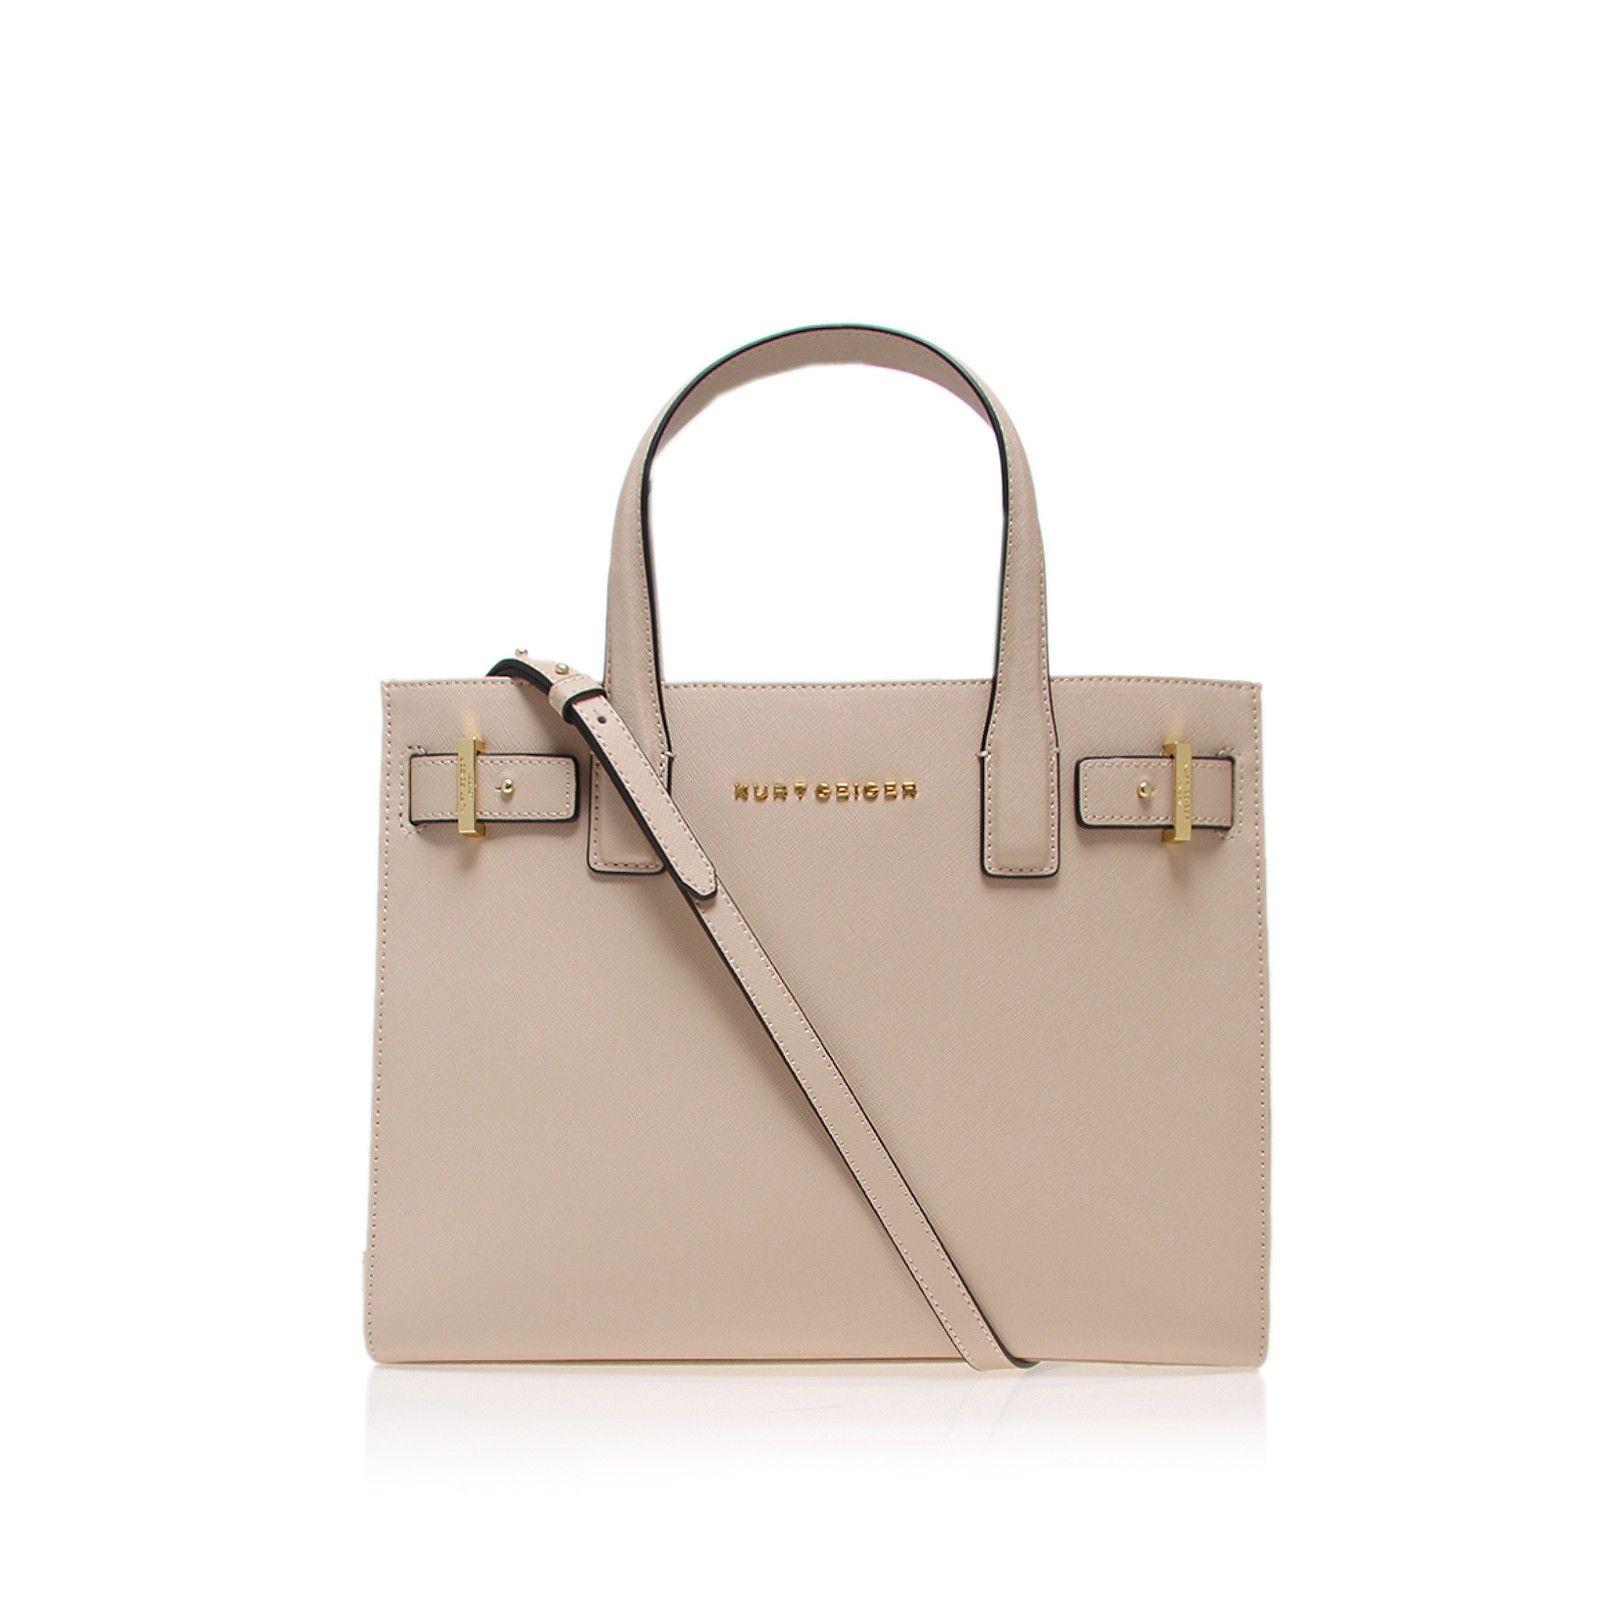 Make Like Sienna With A Classic Tote Bag By Kurt Geiger